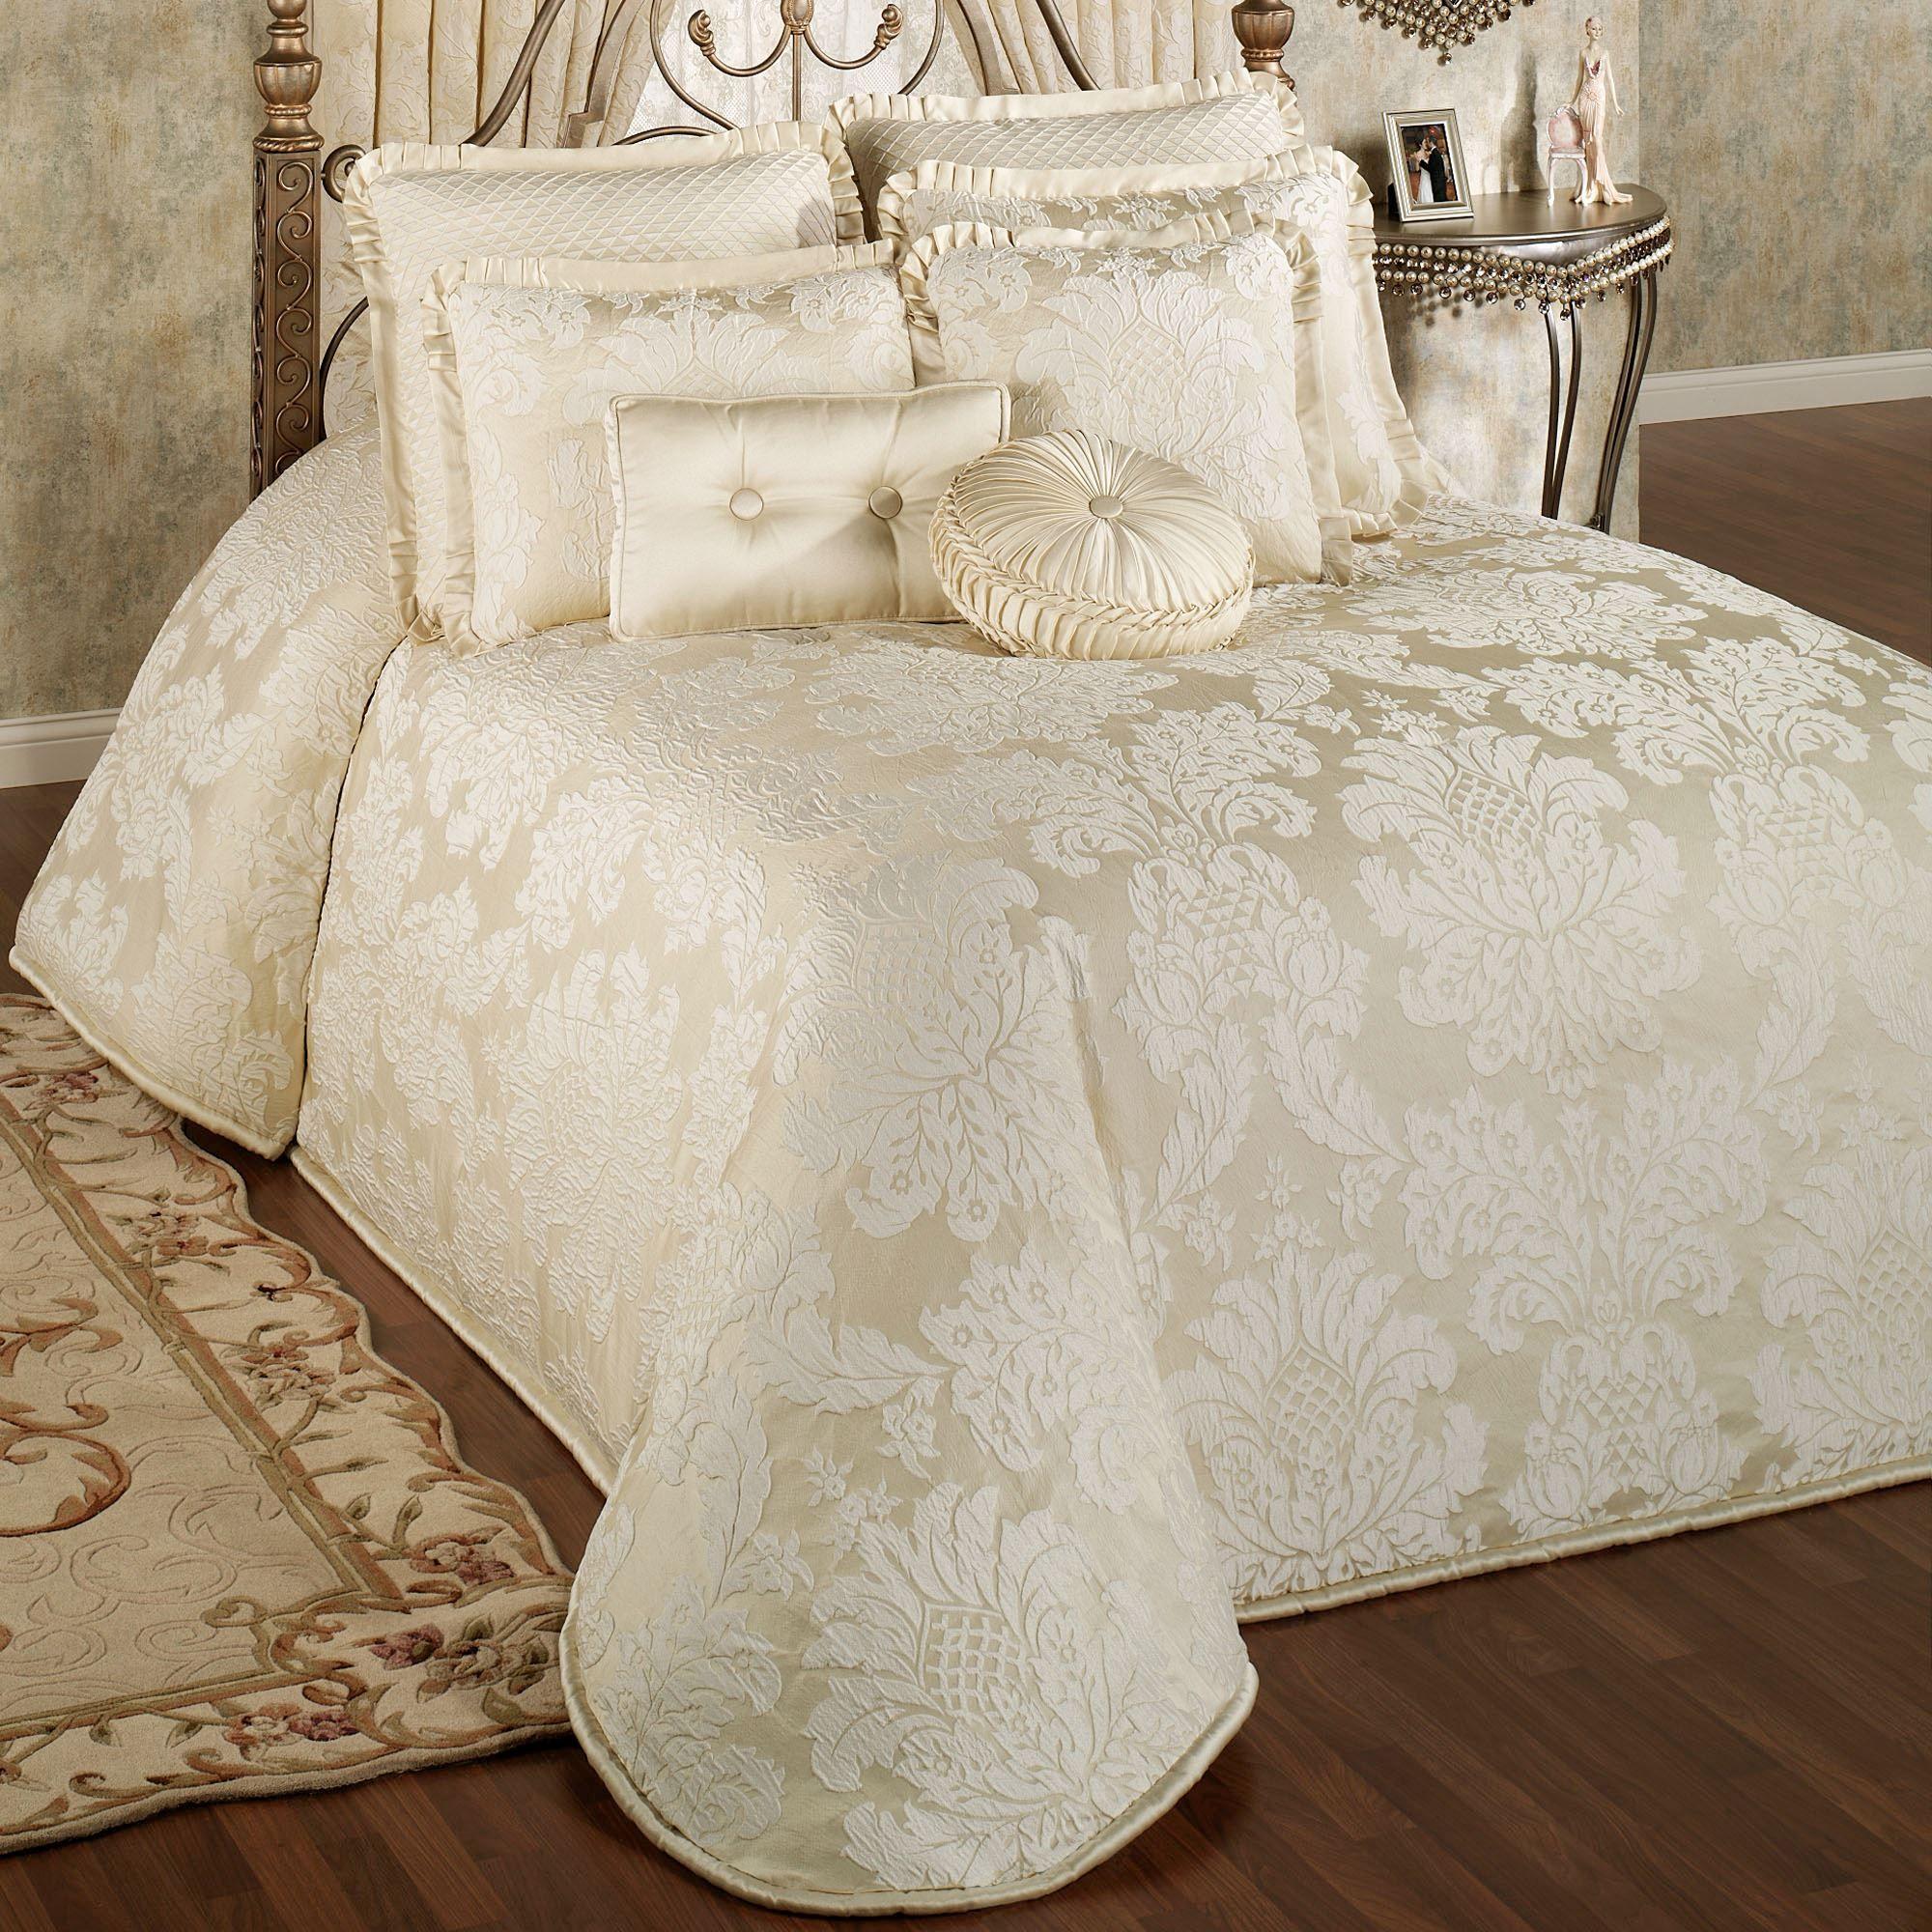 Classique Damask Oversized Bedspread Bedding